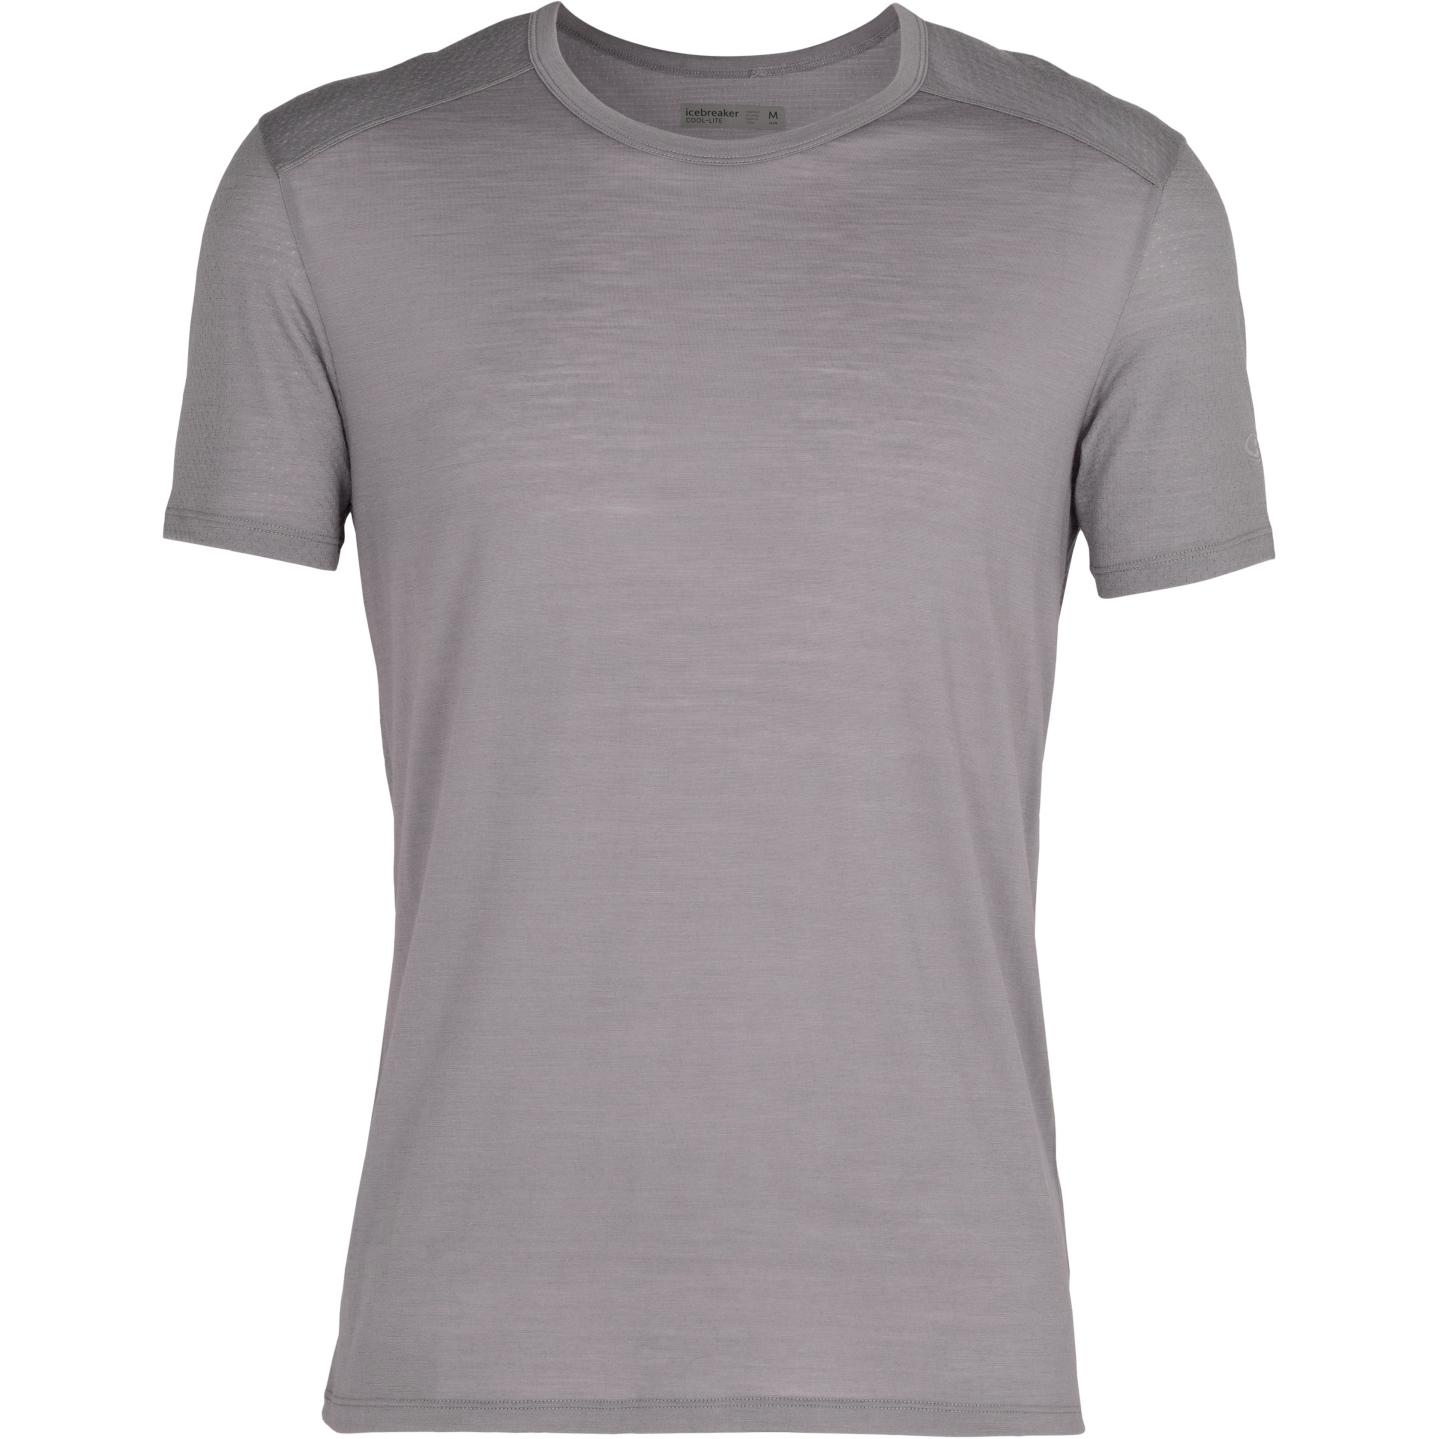 Produktbild von Icebreaker Amplify Crewe Herren T-Shirt - Slate